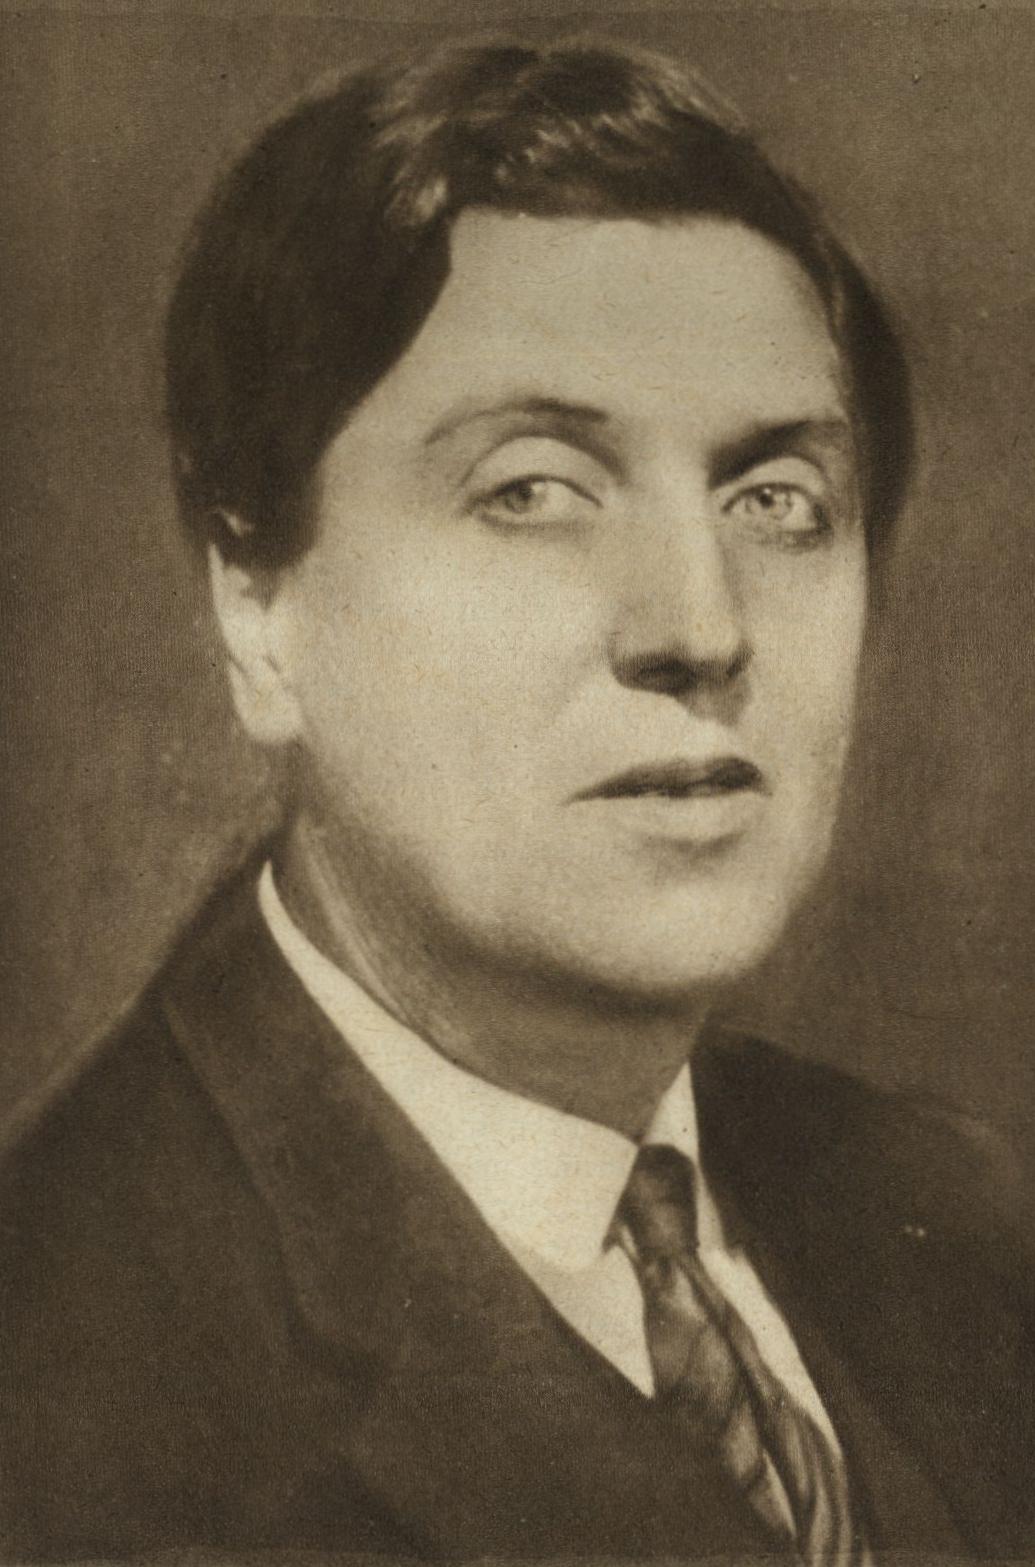 Sommereggers Klassikwelt 74: Alban Berg – musikalischer Traditionalist und Neuerer